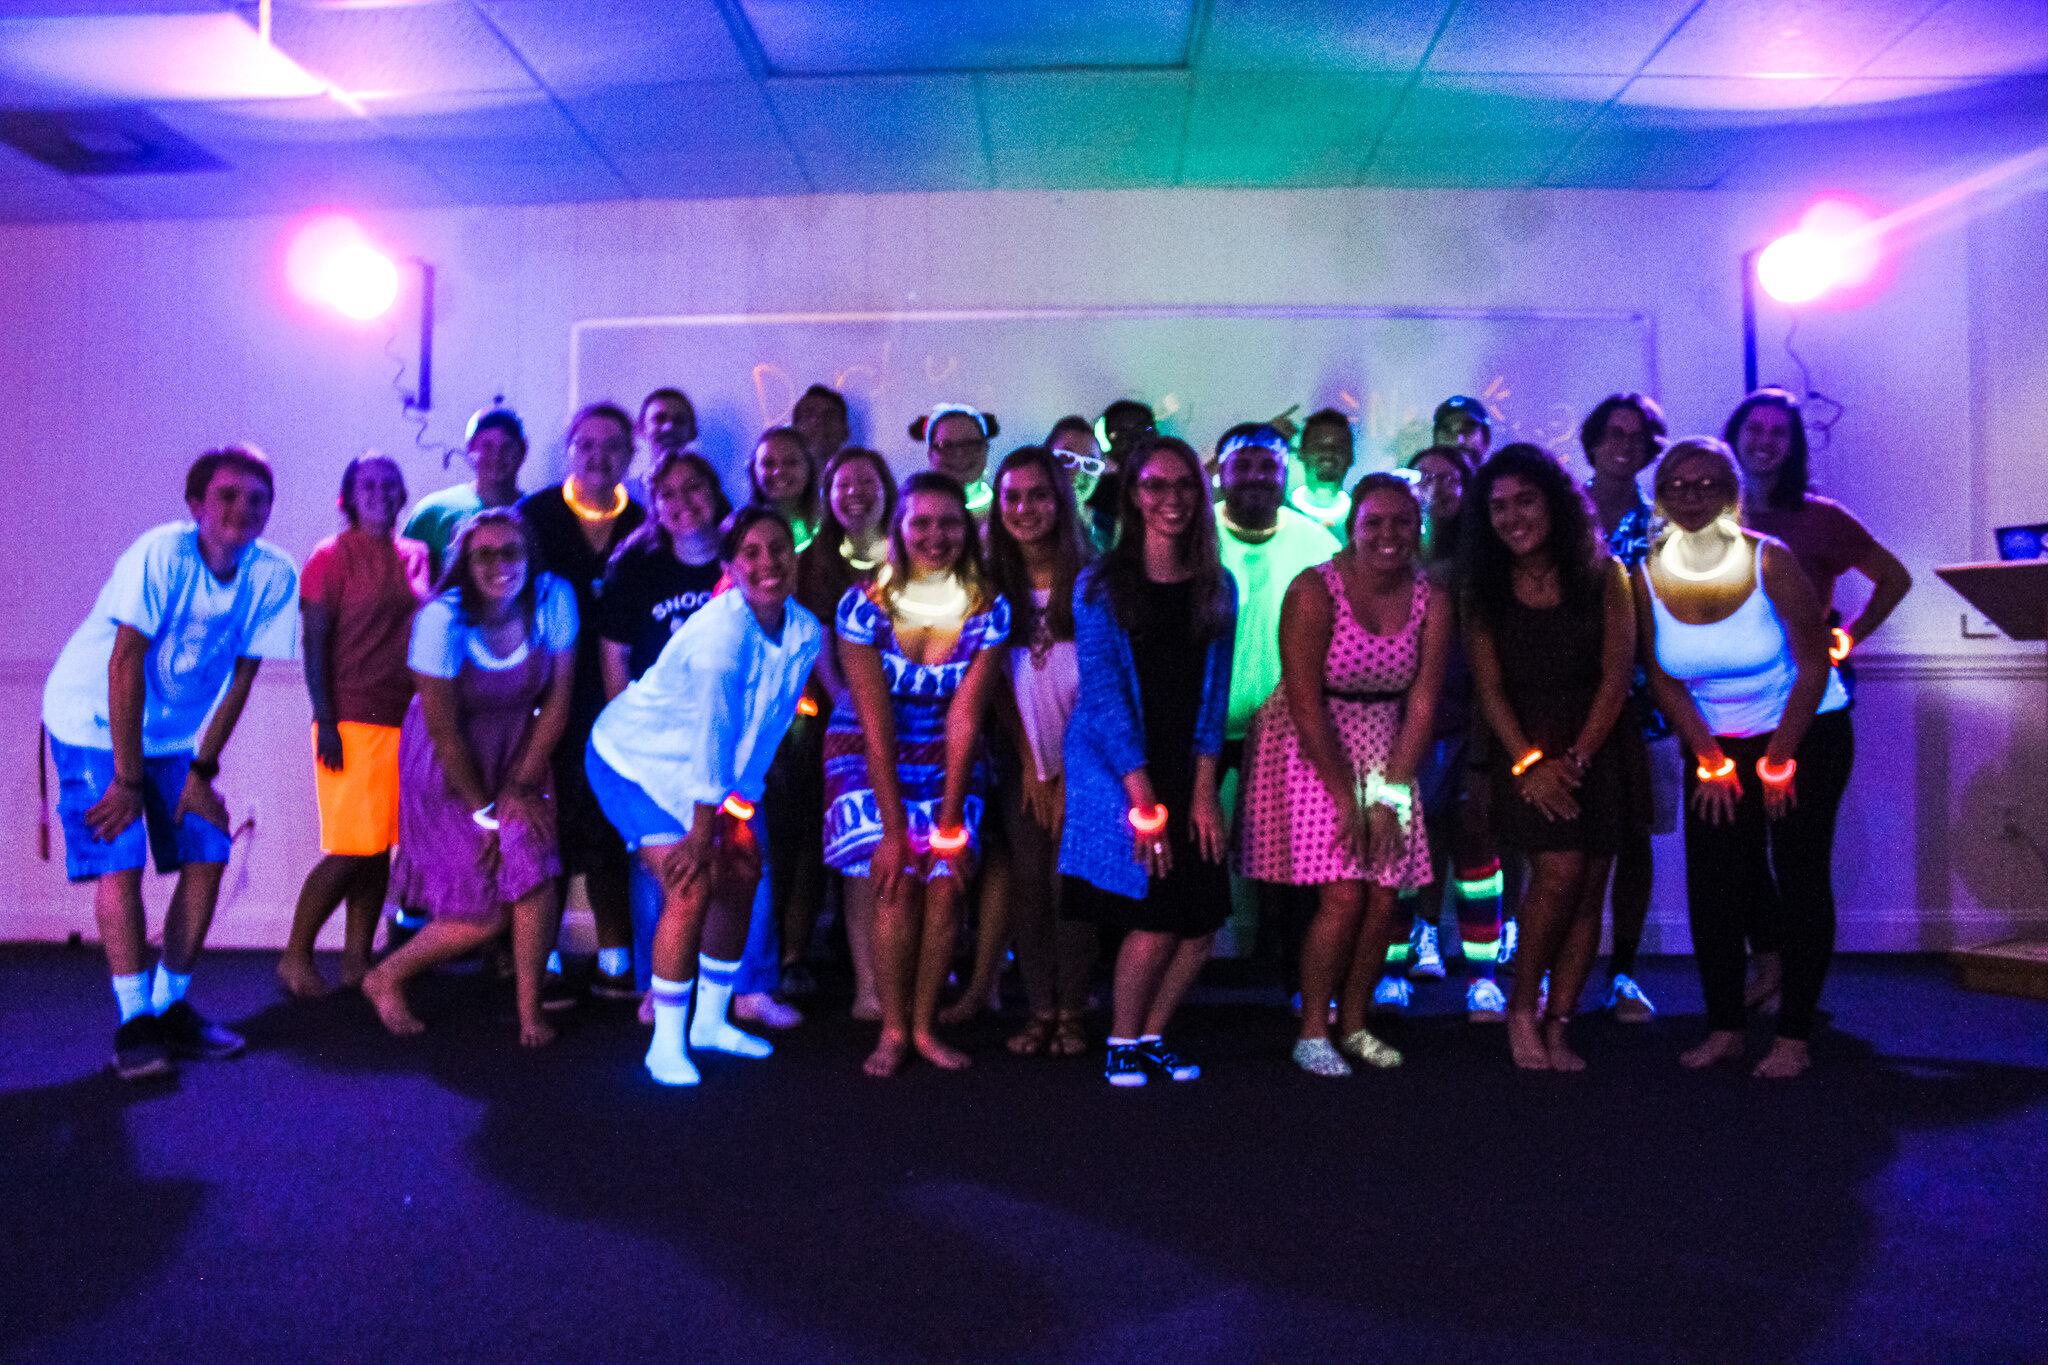 Group photo of the NGU Swing Club.